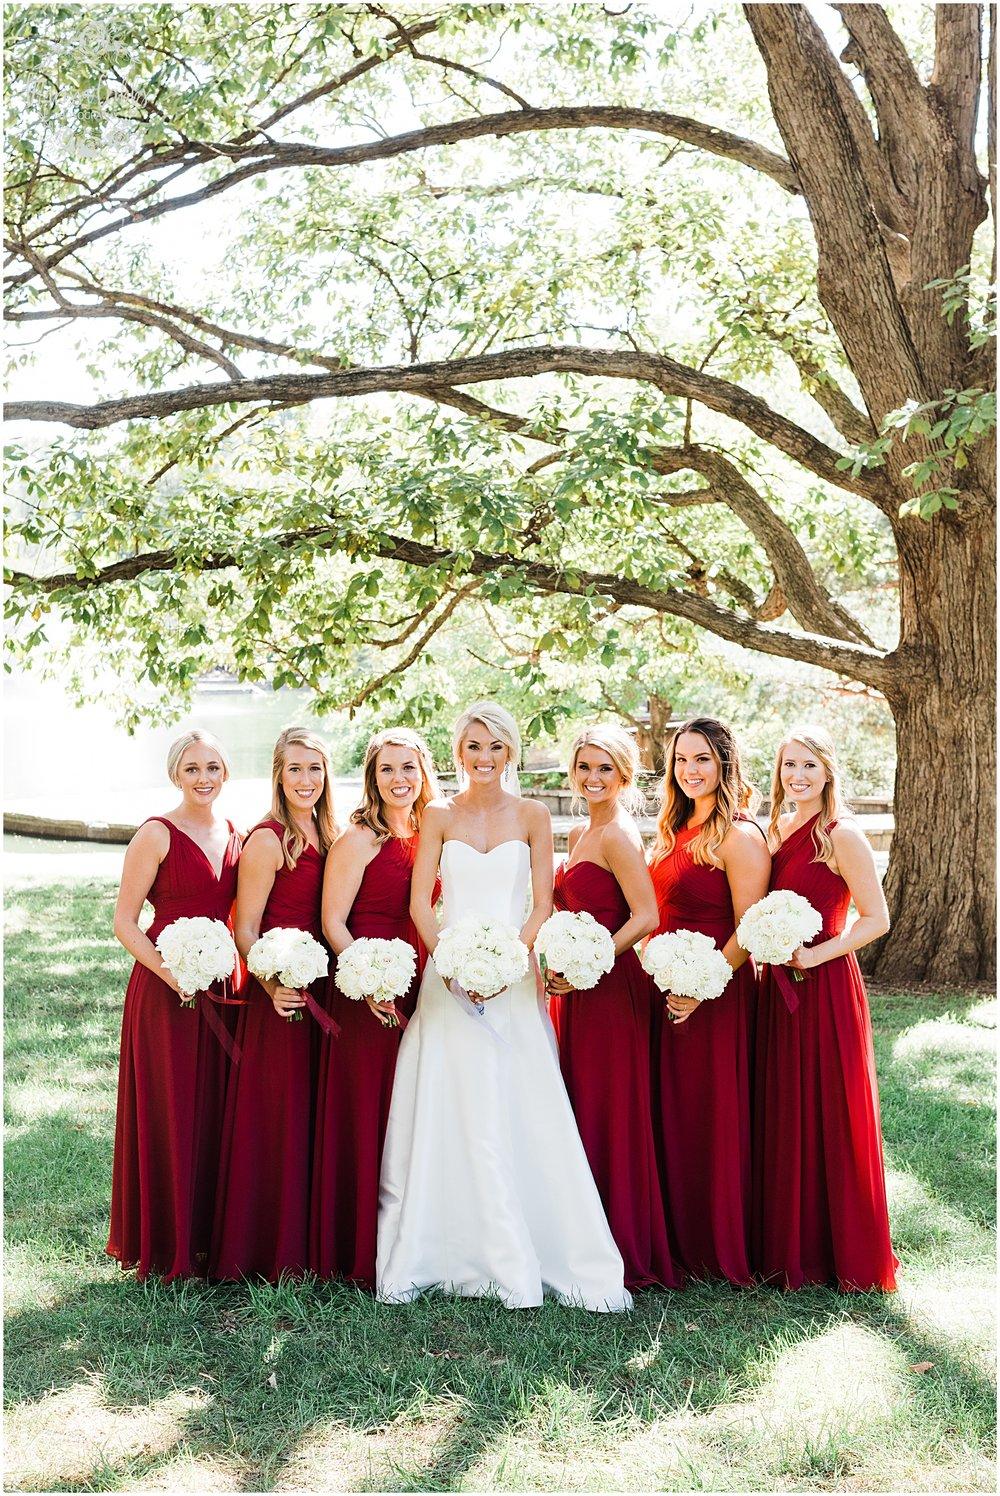 NOLL WEDDING | THE BRASS ON BALTIMORE | MARISSA CRIBBS PHOTOGRAPHY_6299.jpg